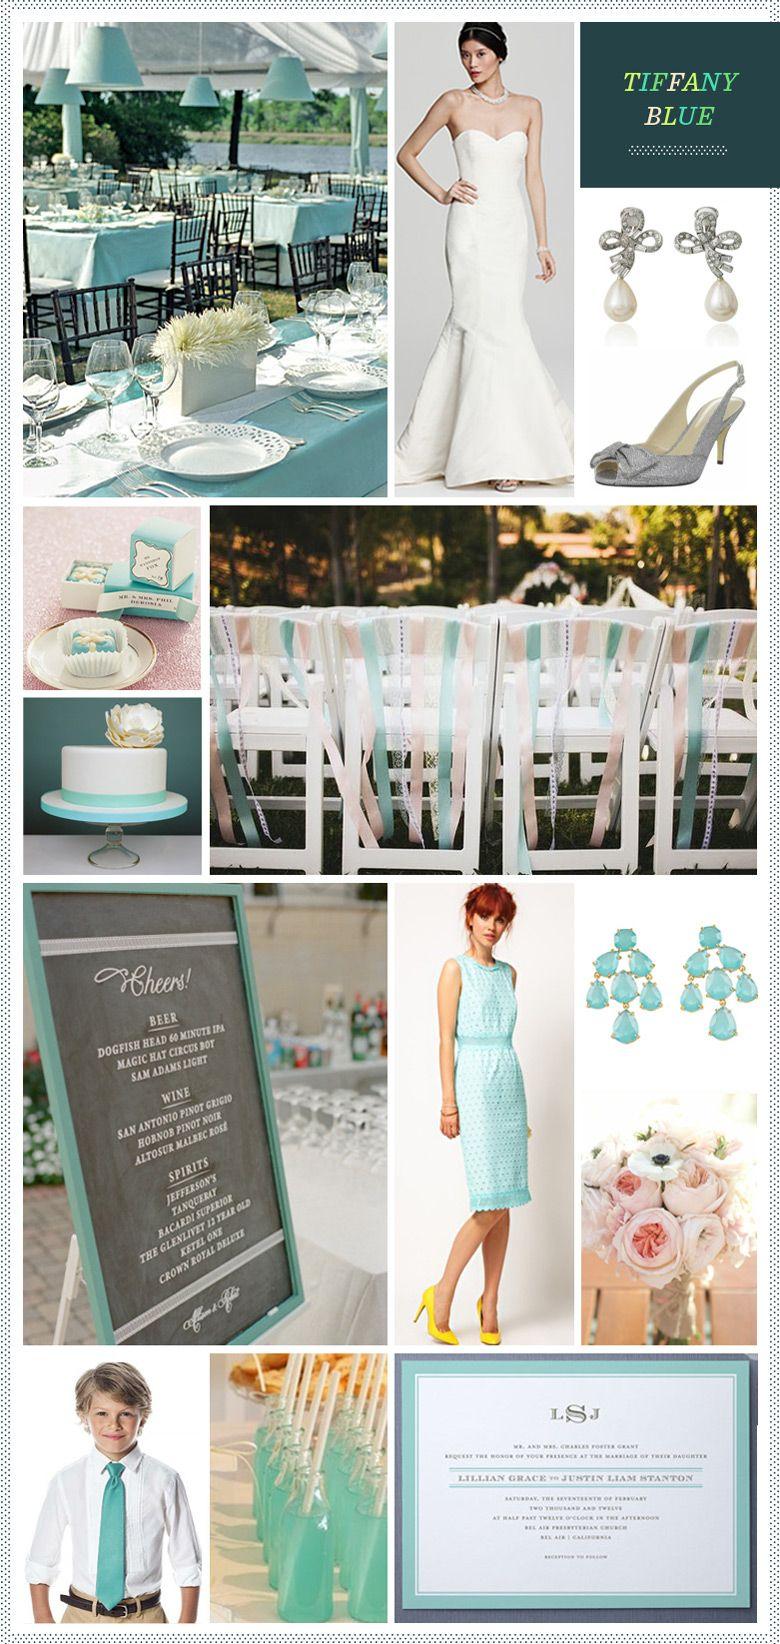 Tiffany Blue wedding inspiration   12.13.14 ❤   Pinterest ...